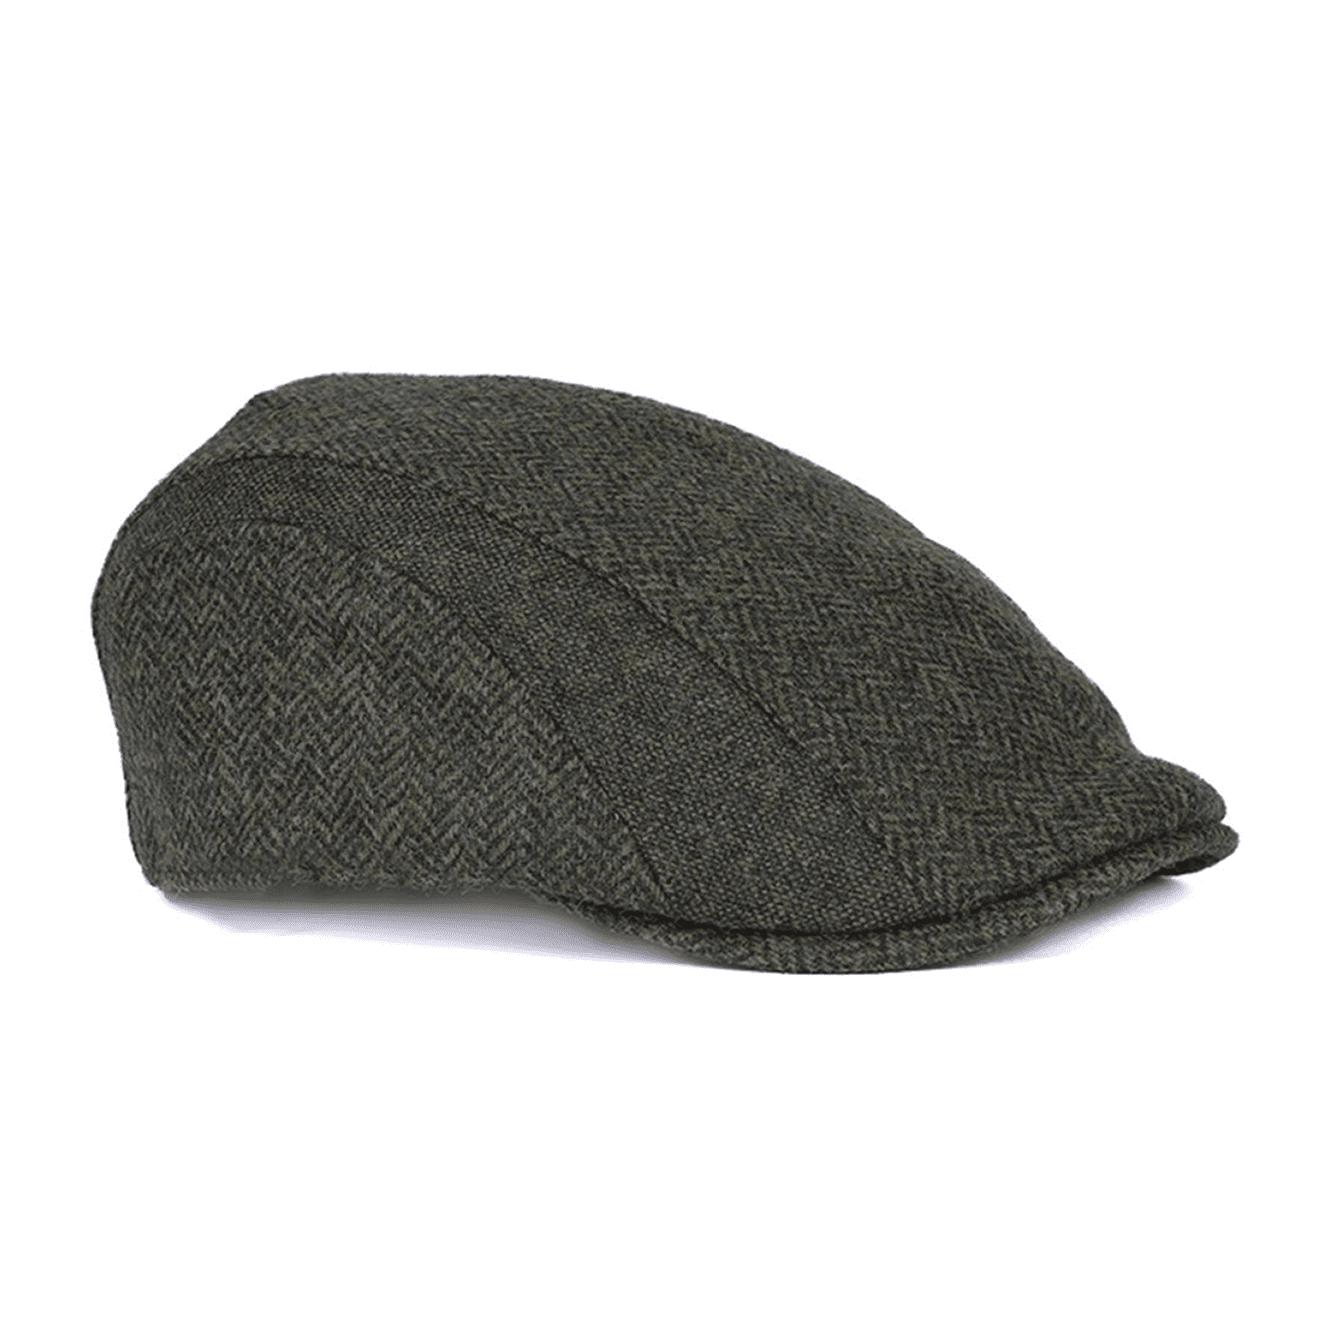 Barbour Herringbone Tweed Cap Olive - The Sporting Lodge ec8c4422232